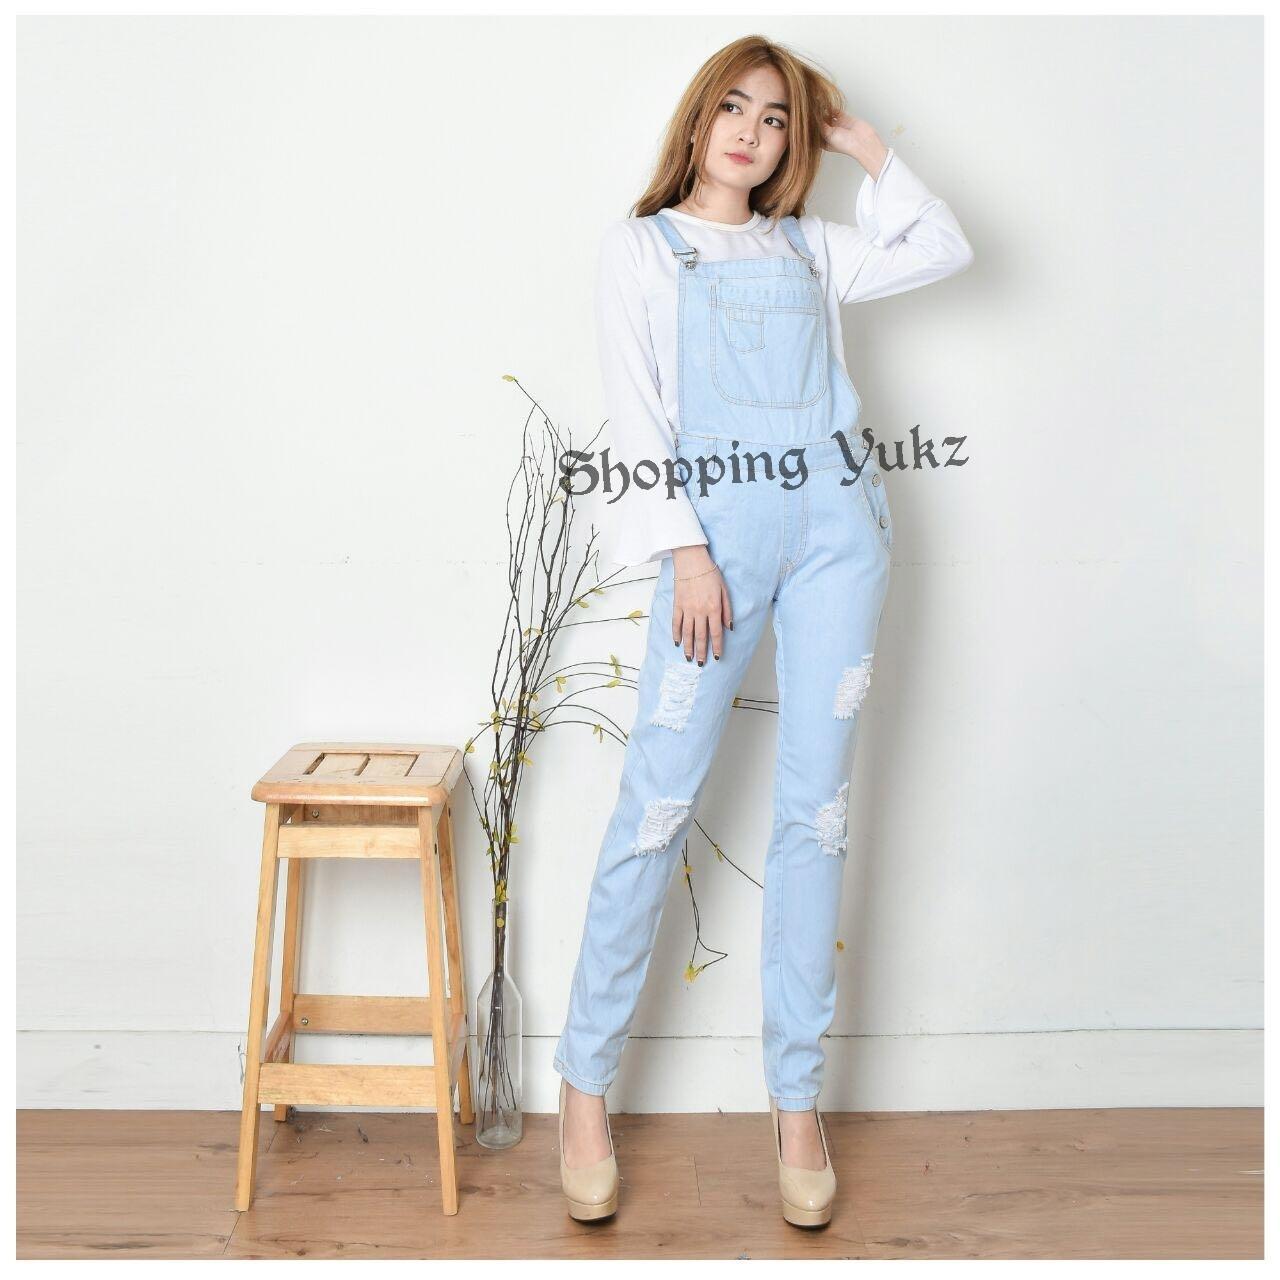 Shopping Yukz Overall Jumpsuit Jeans Denim  Wanita ENMA ( Tanpa Inner ) - SOFT BLUE /Baju Kodok Jeans /Jumpsuit Jeans/ Ripped Jeans/Jumpsuit Denim Wanita/Jumpsuit Remaja/Jumpsuit Murah/Jumpsuit Terusan/Jumpsuit Panjang/Jumsuit Wanita/Jumsuit Denim